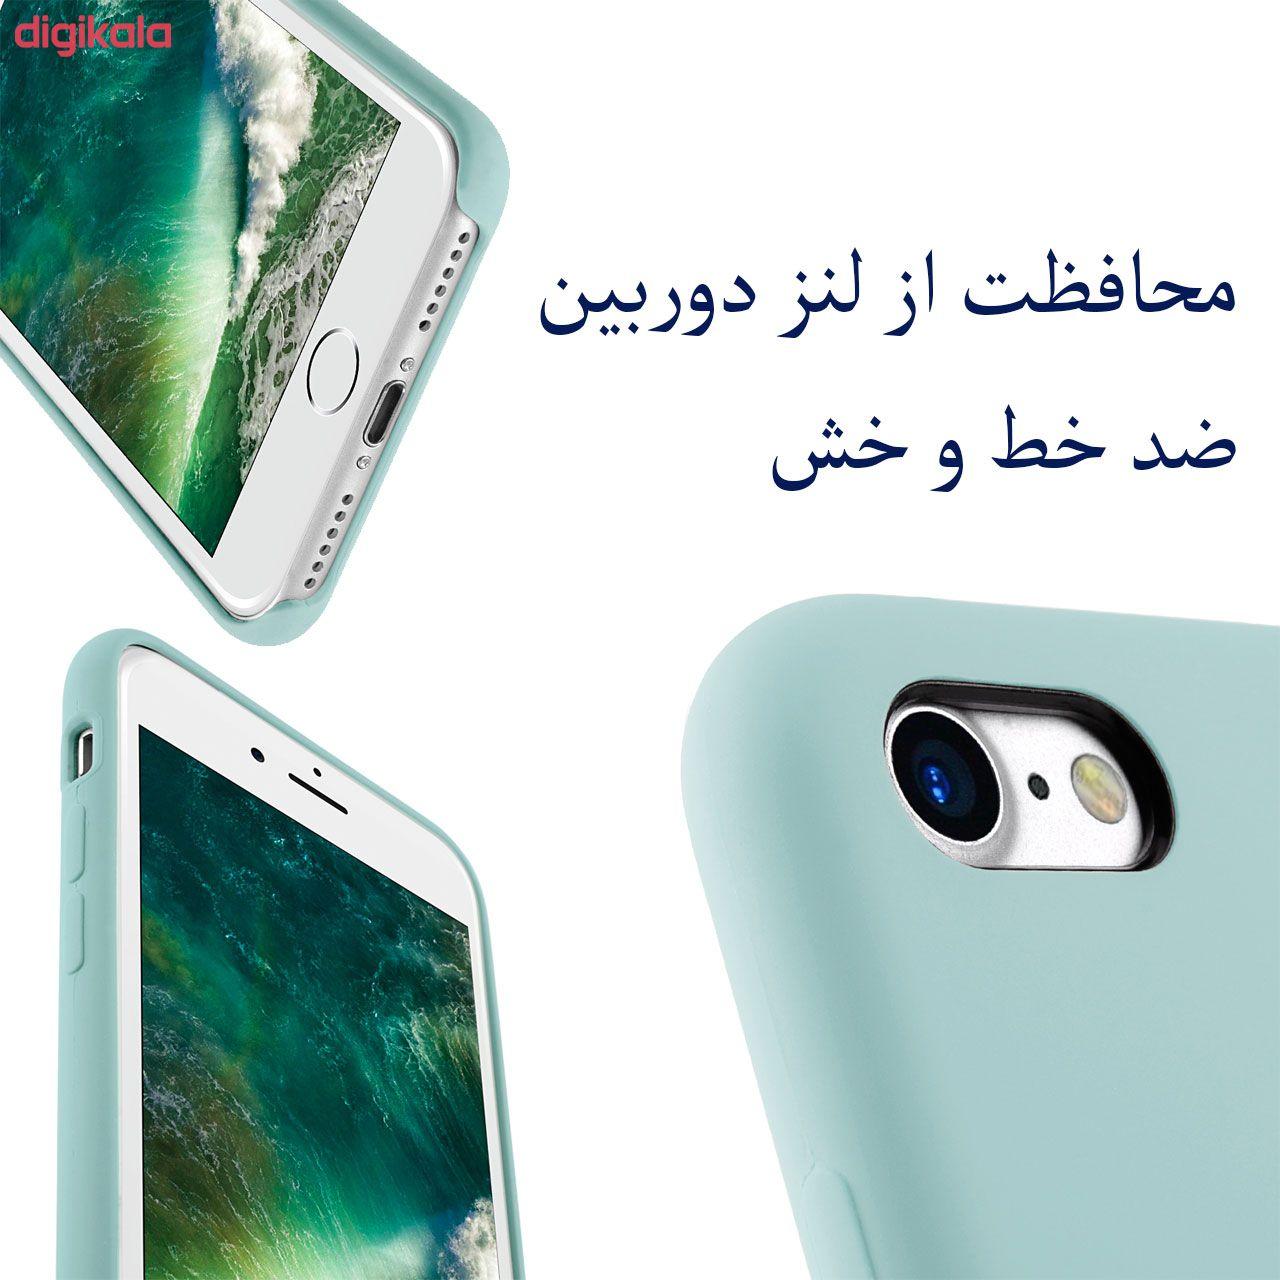 کاور مدل SLCN مناسب برای گوشی موبایل اپل iPhone 7 main 1 5